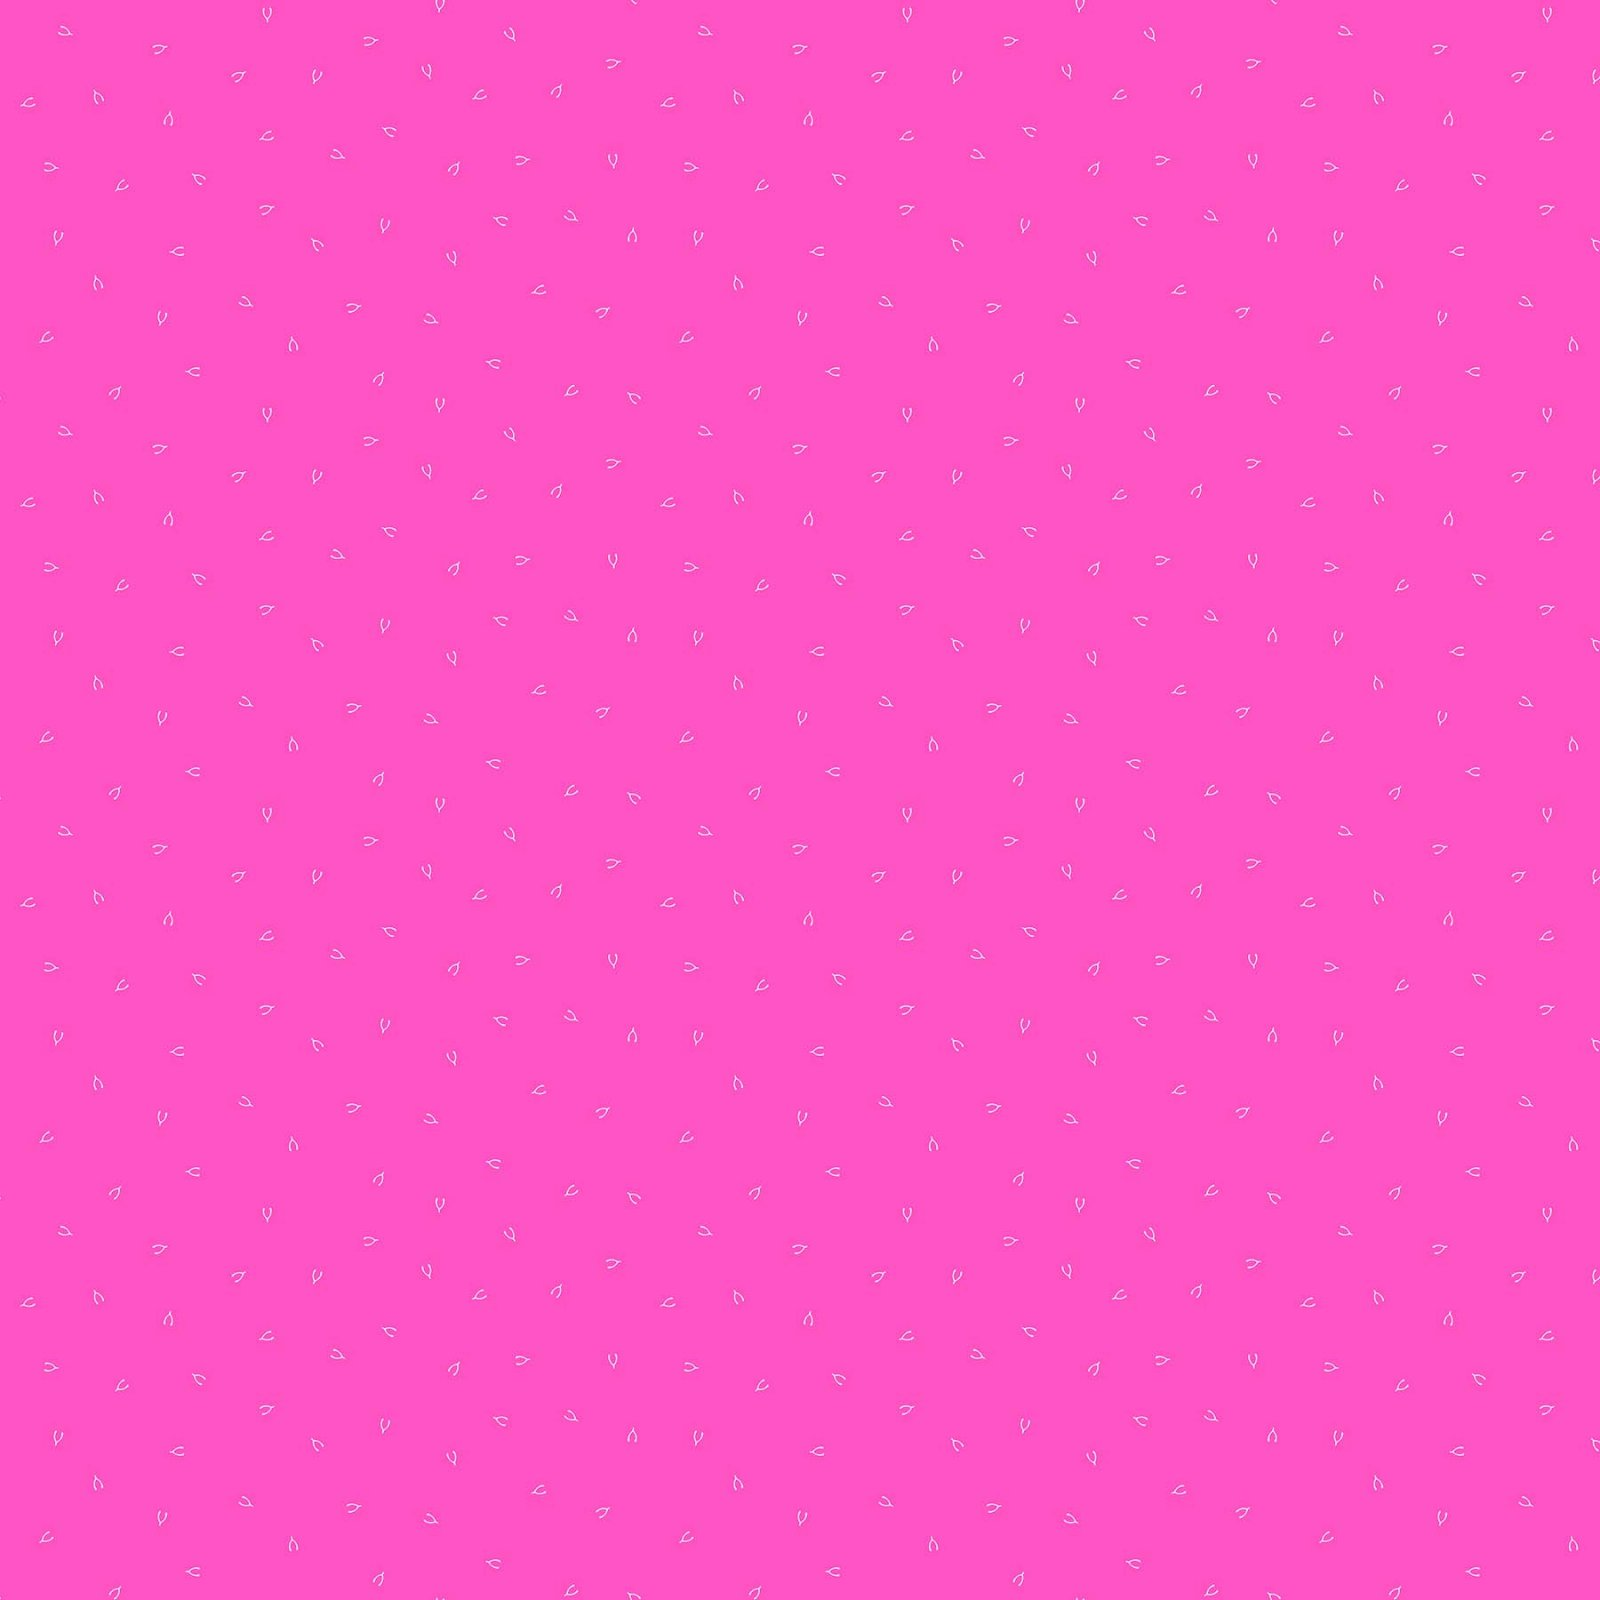 Lucky Charms Basics by Figo 92000 28 Pink Wishbones